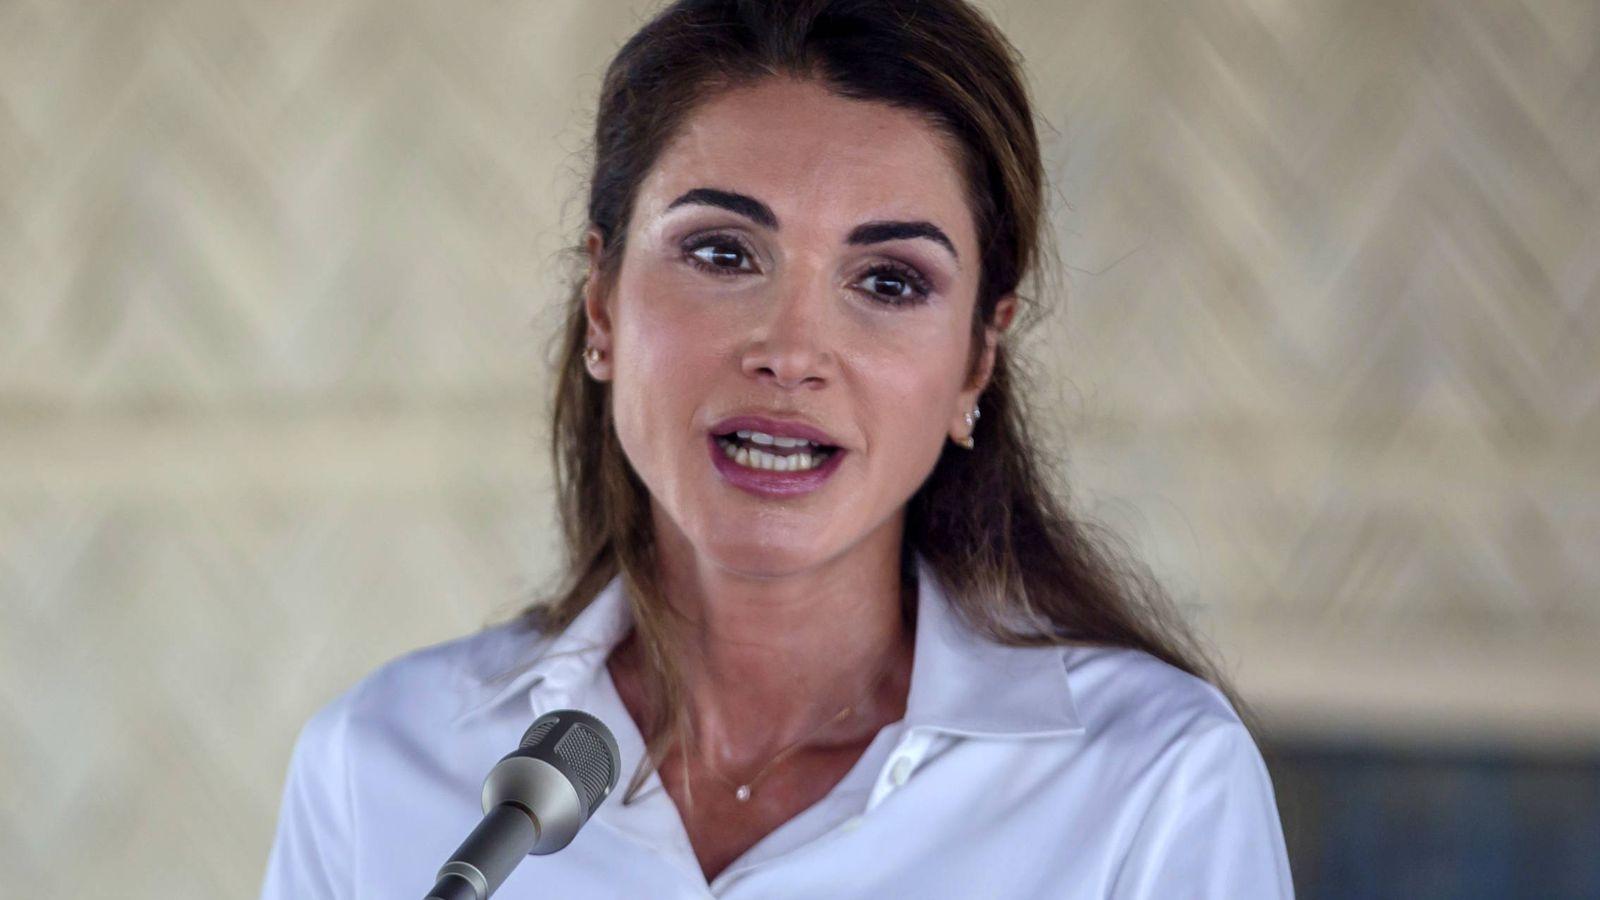 Foto:  Rania de Jordania, una reina que marca tendencia. (Gtres)